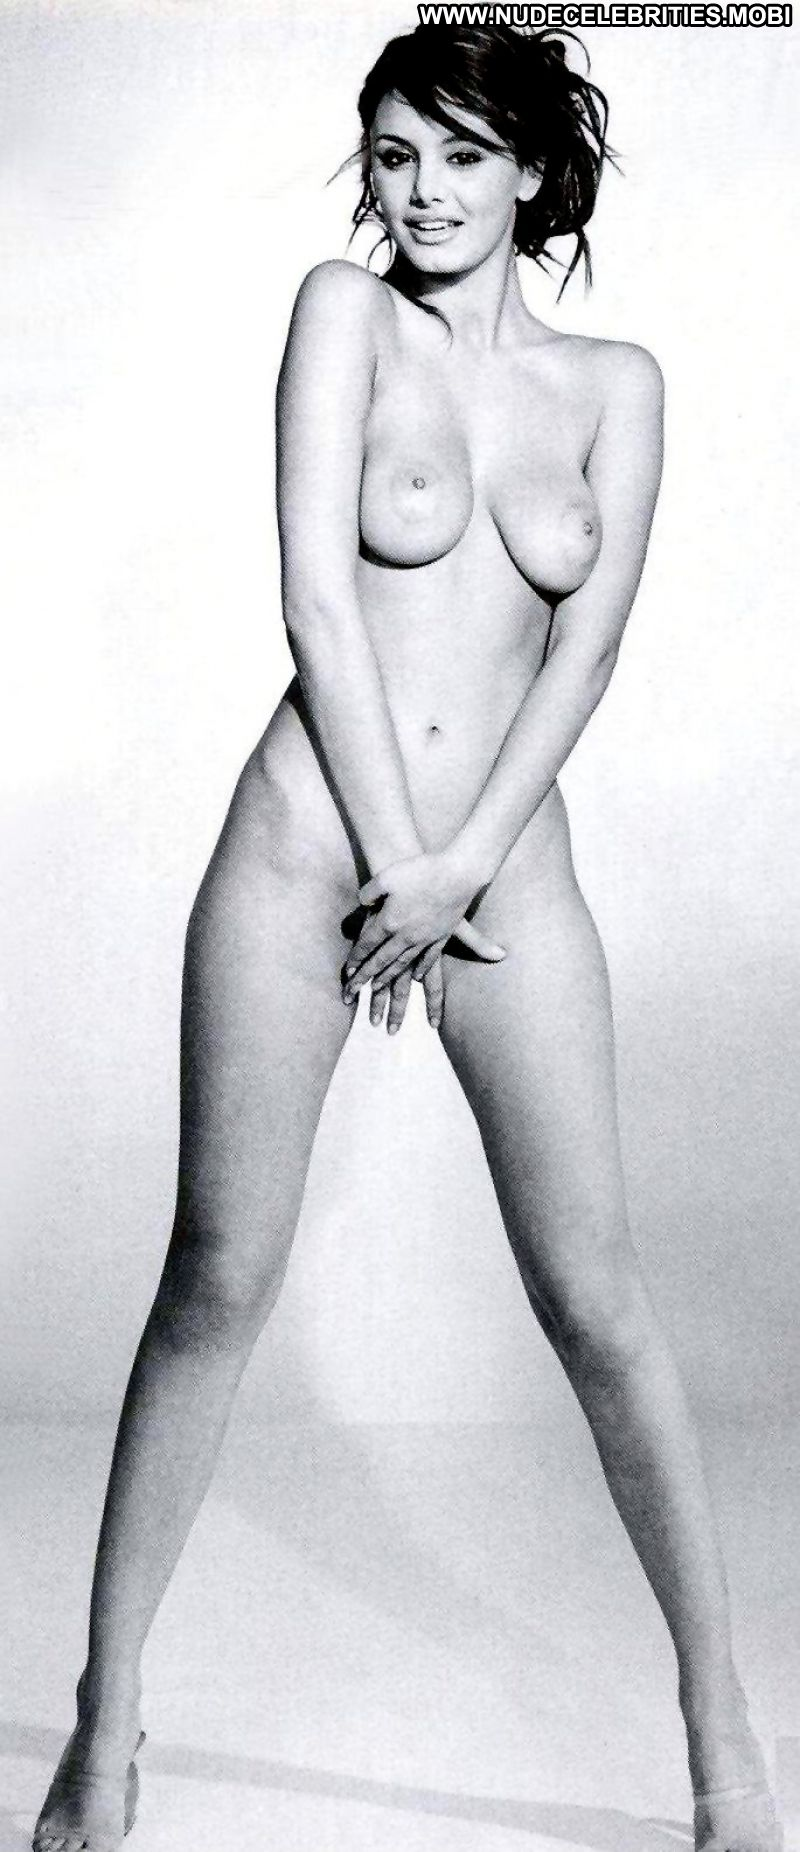 malay gir with nude